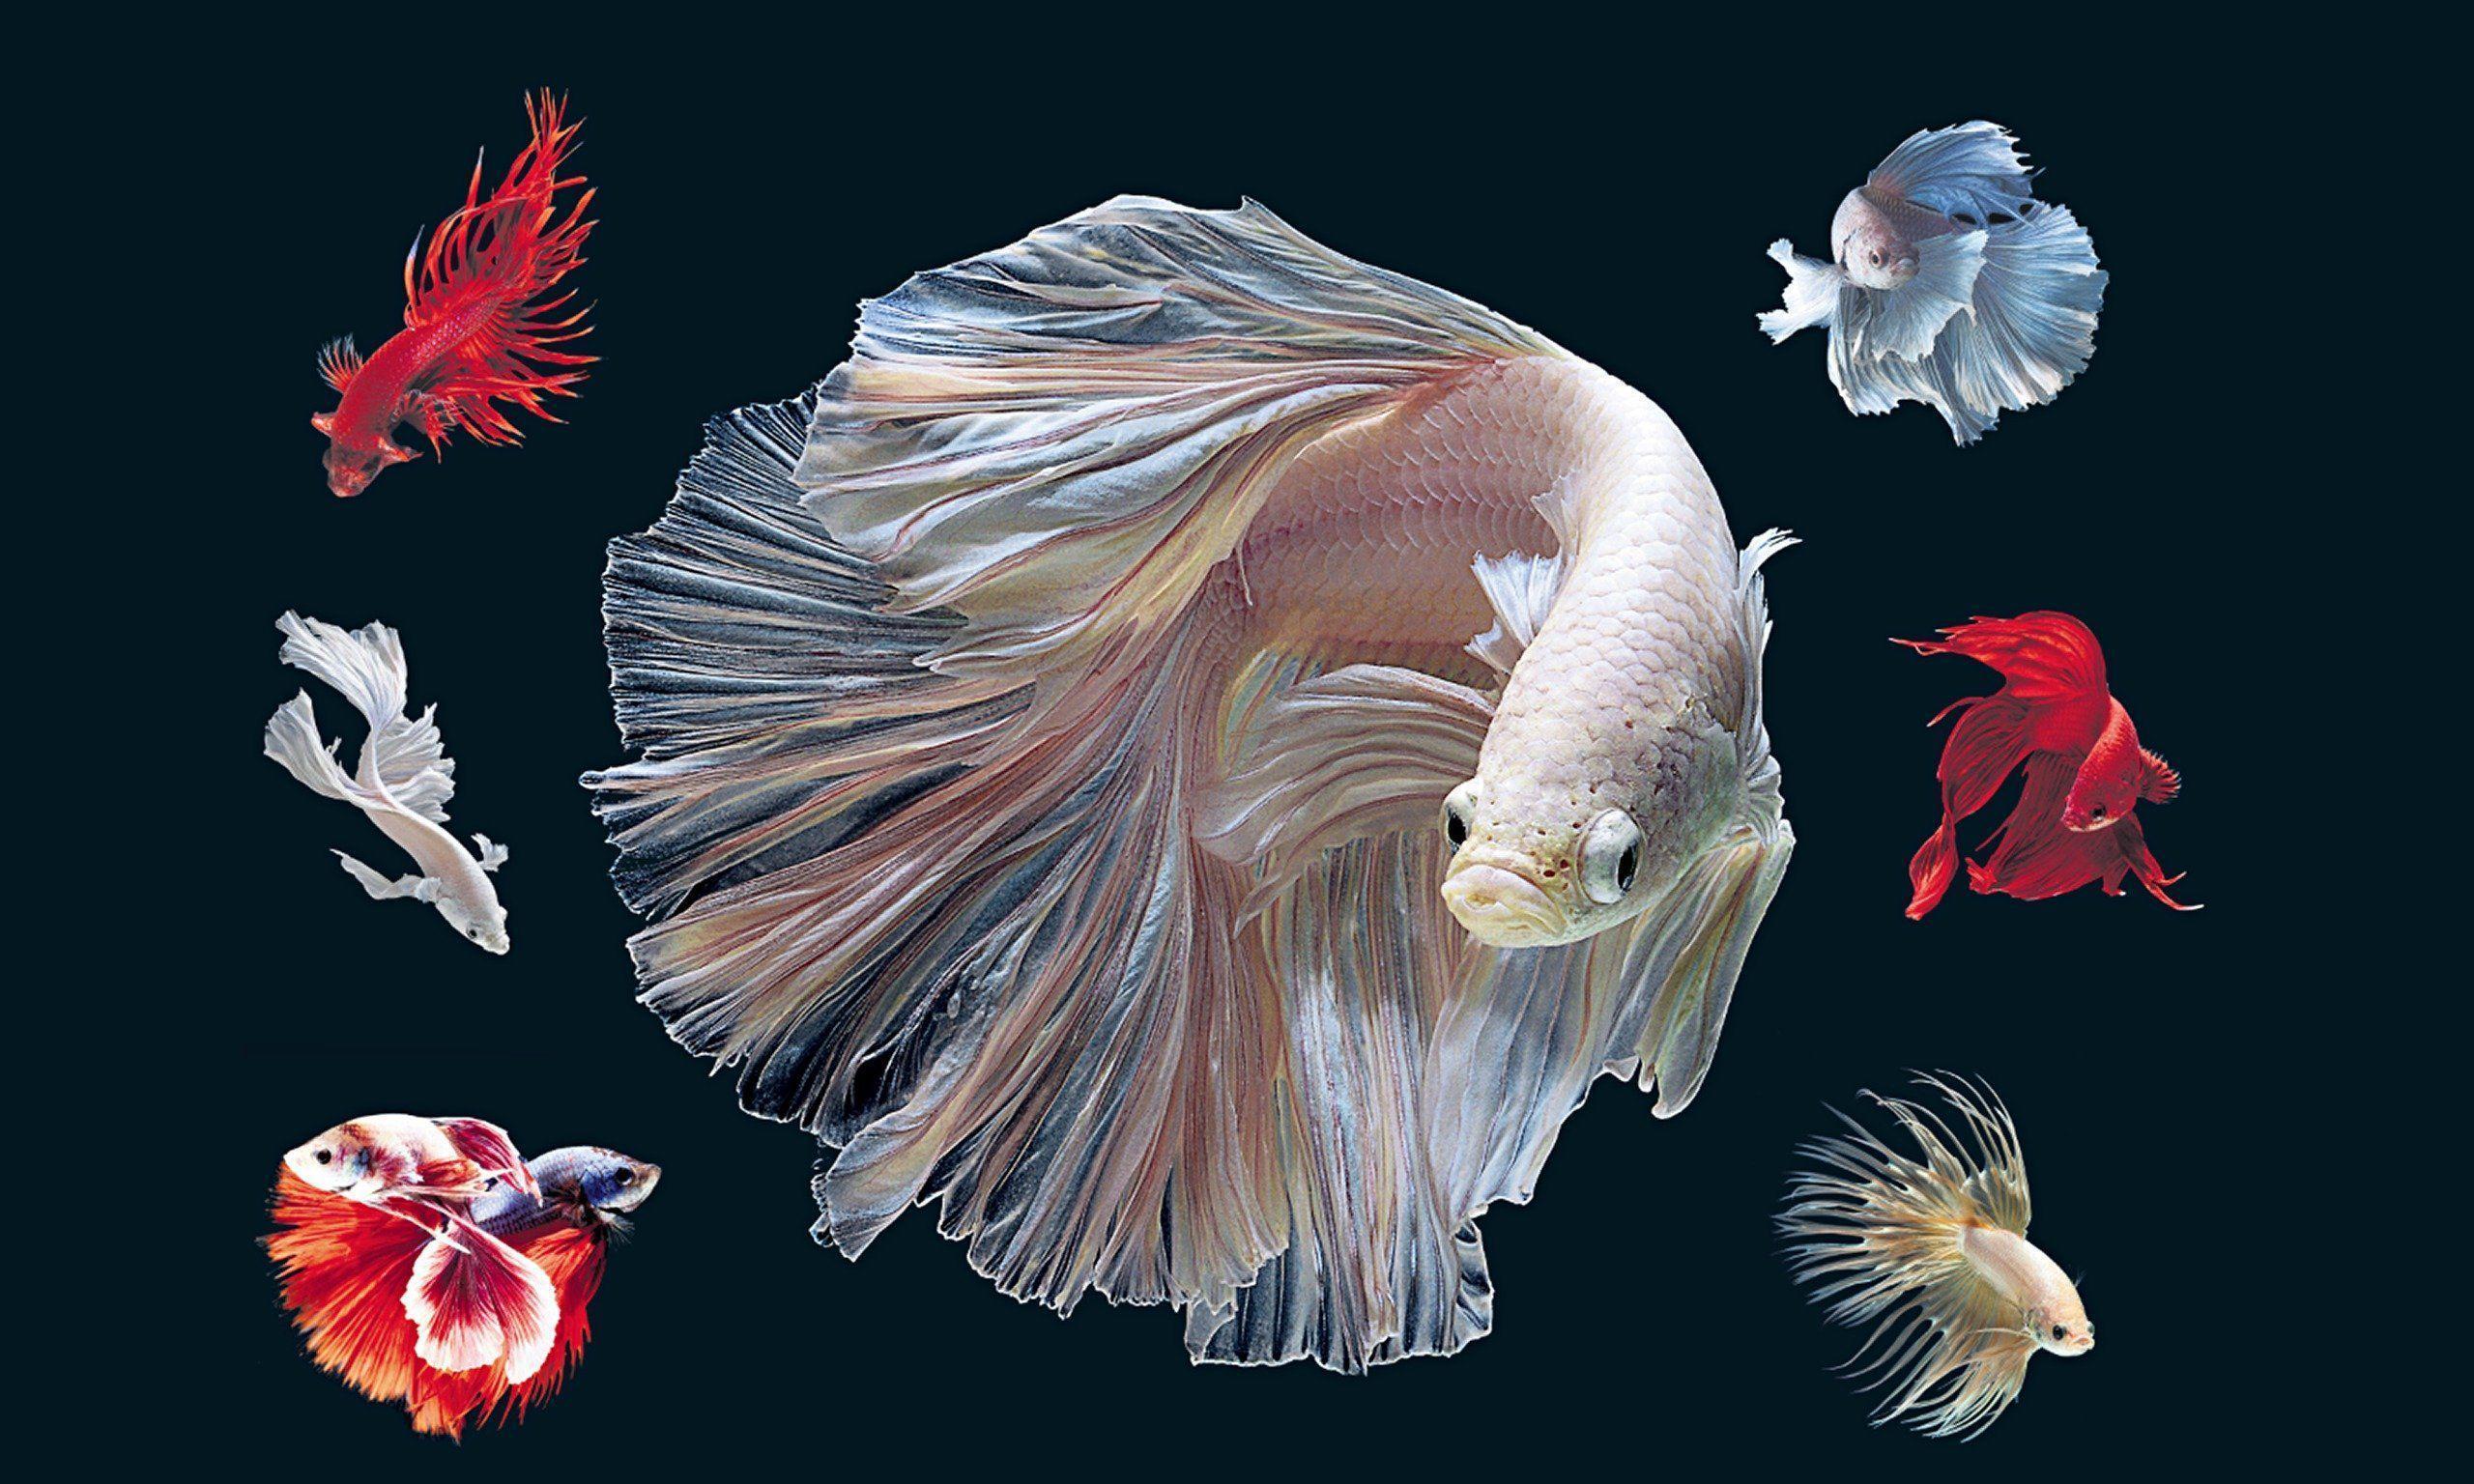 Betta Fish Wallpapers - Wallpaper Cave